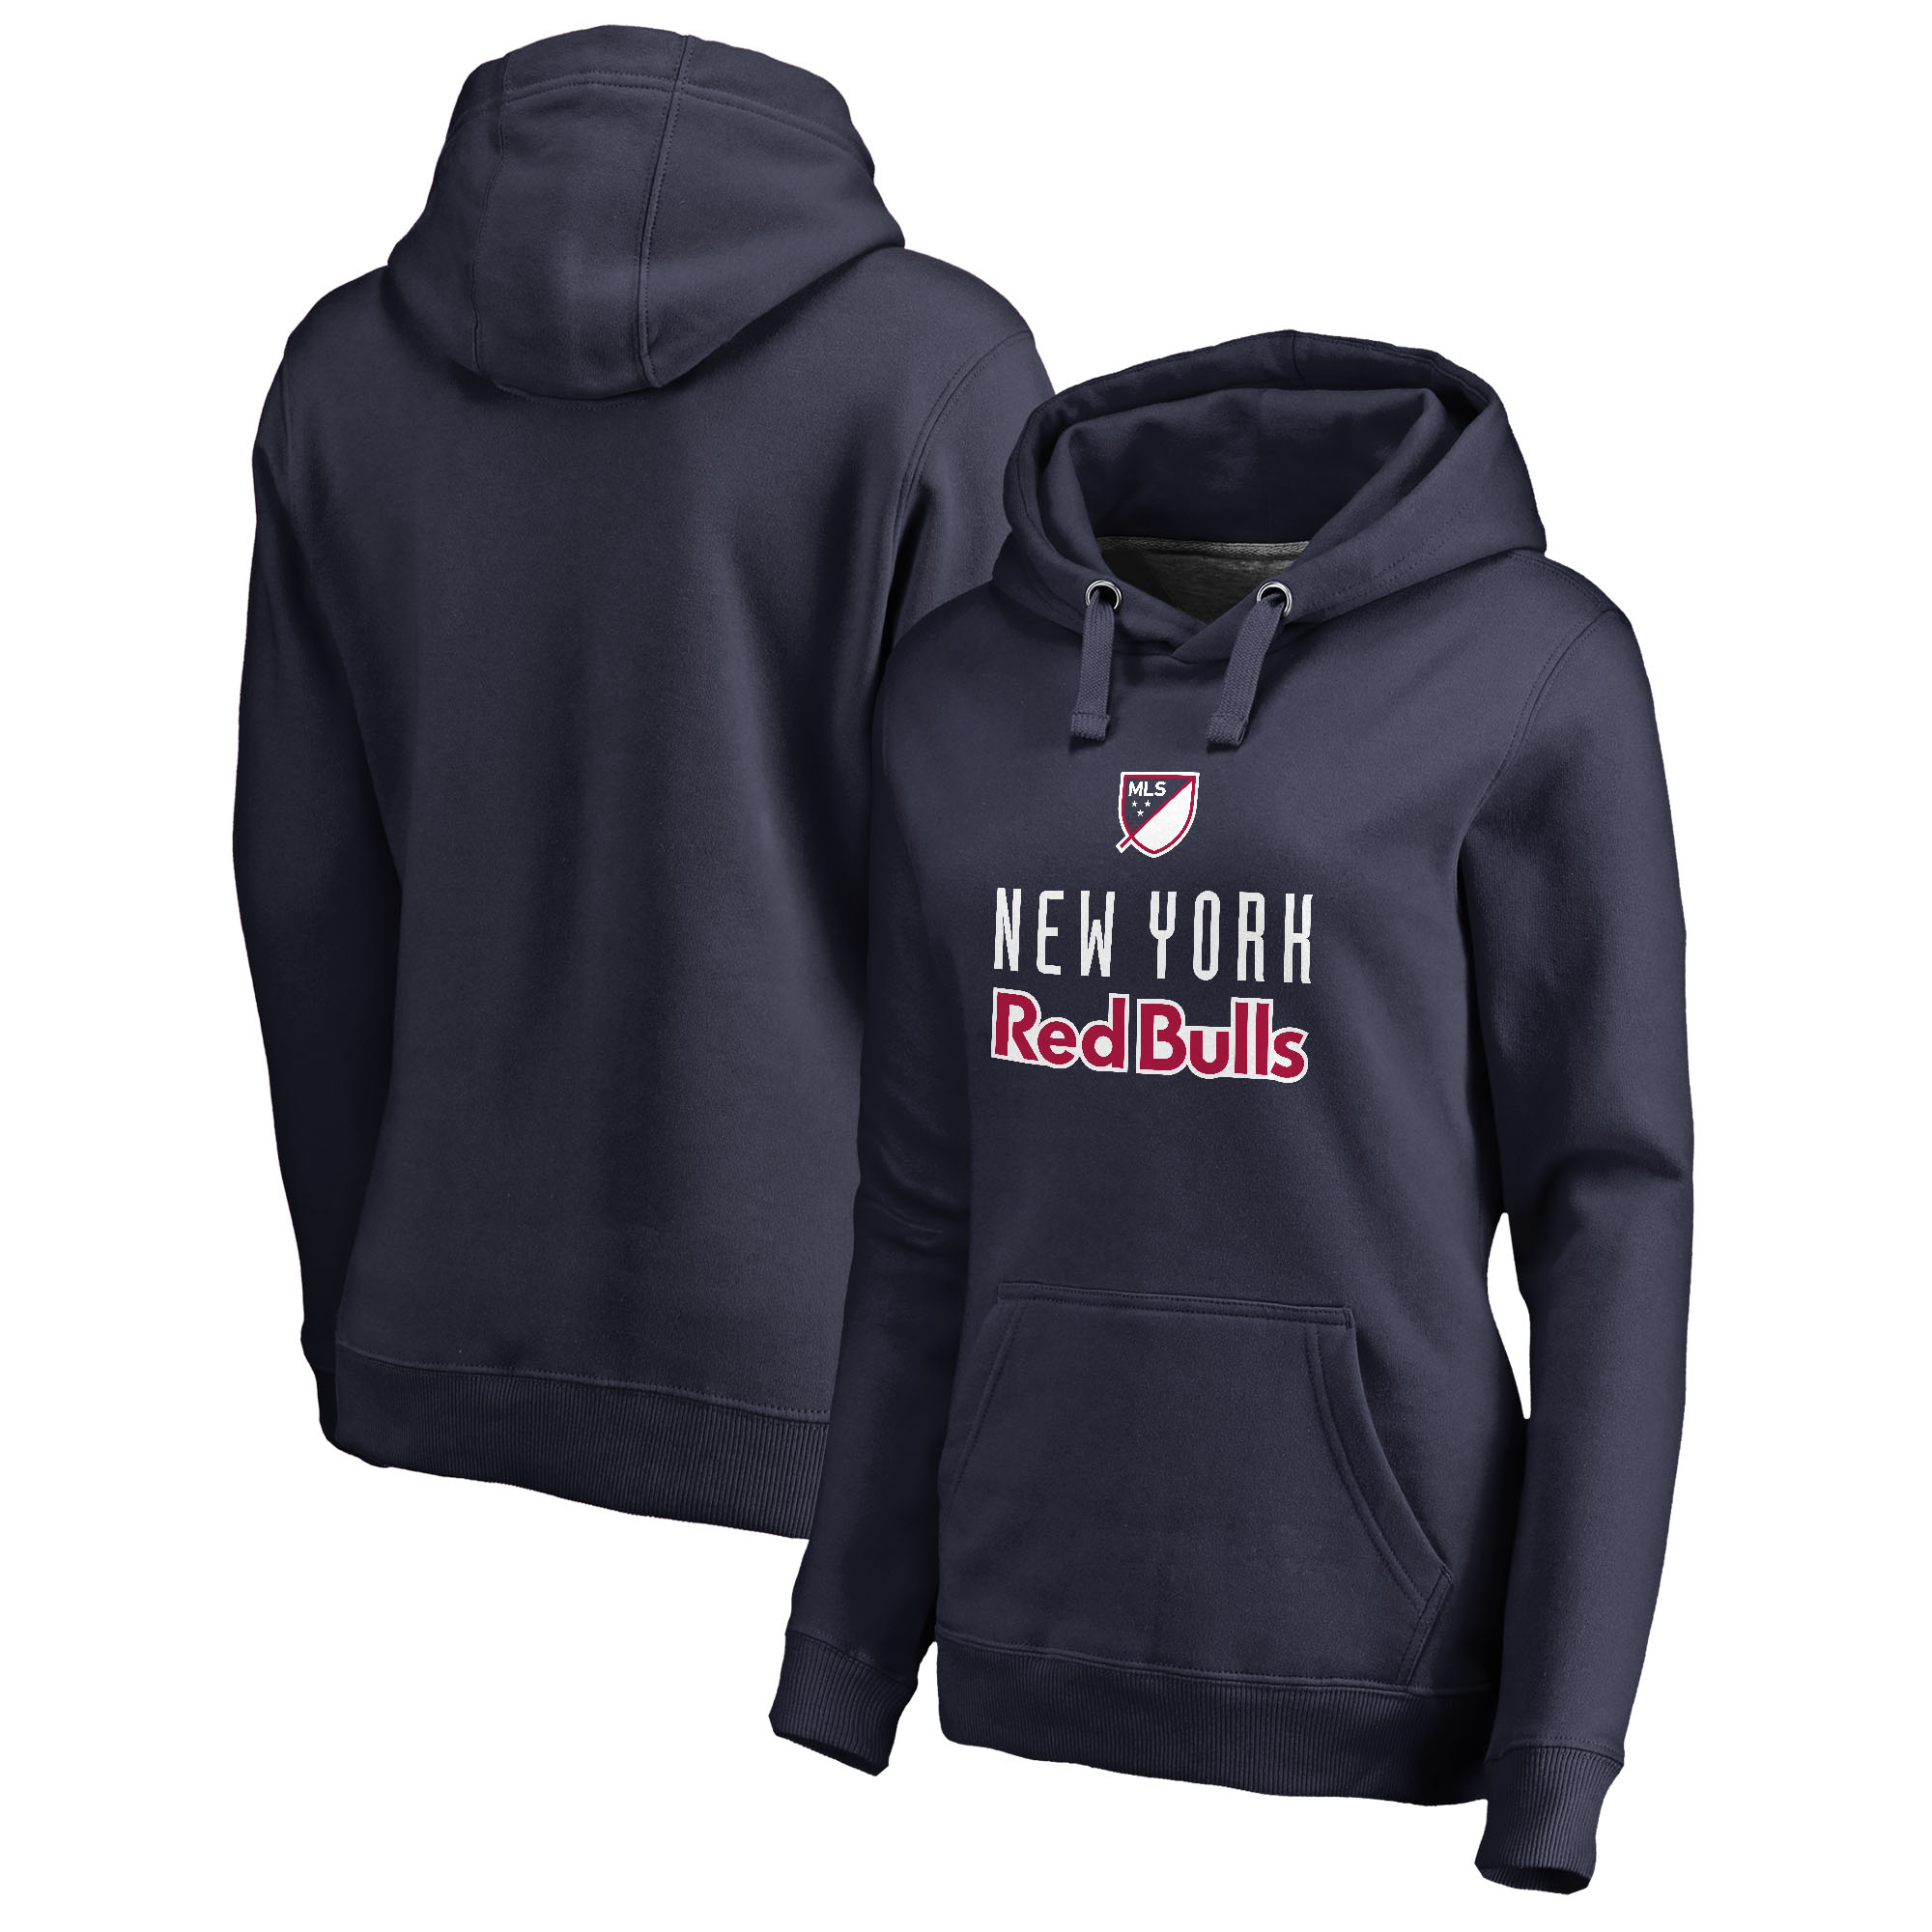 New York Red Bulls Fanatics Branded Women's Shielded Pullover Hoodie - Navy